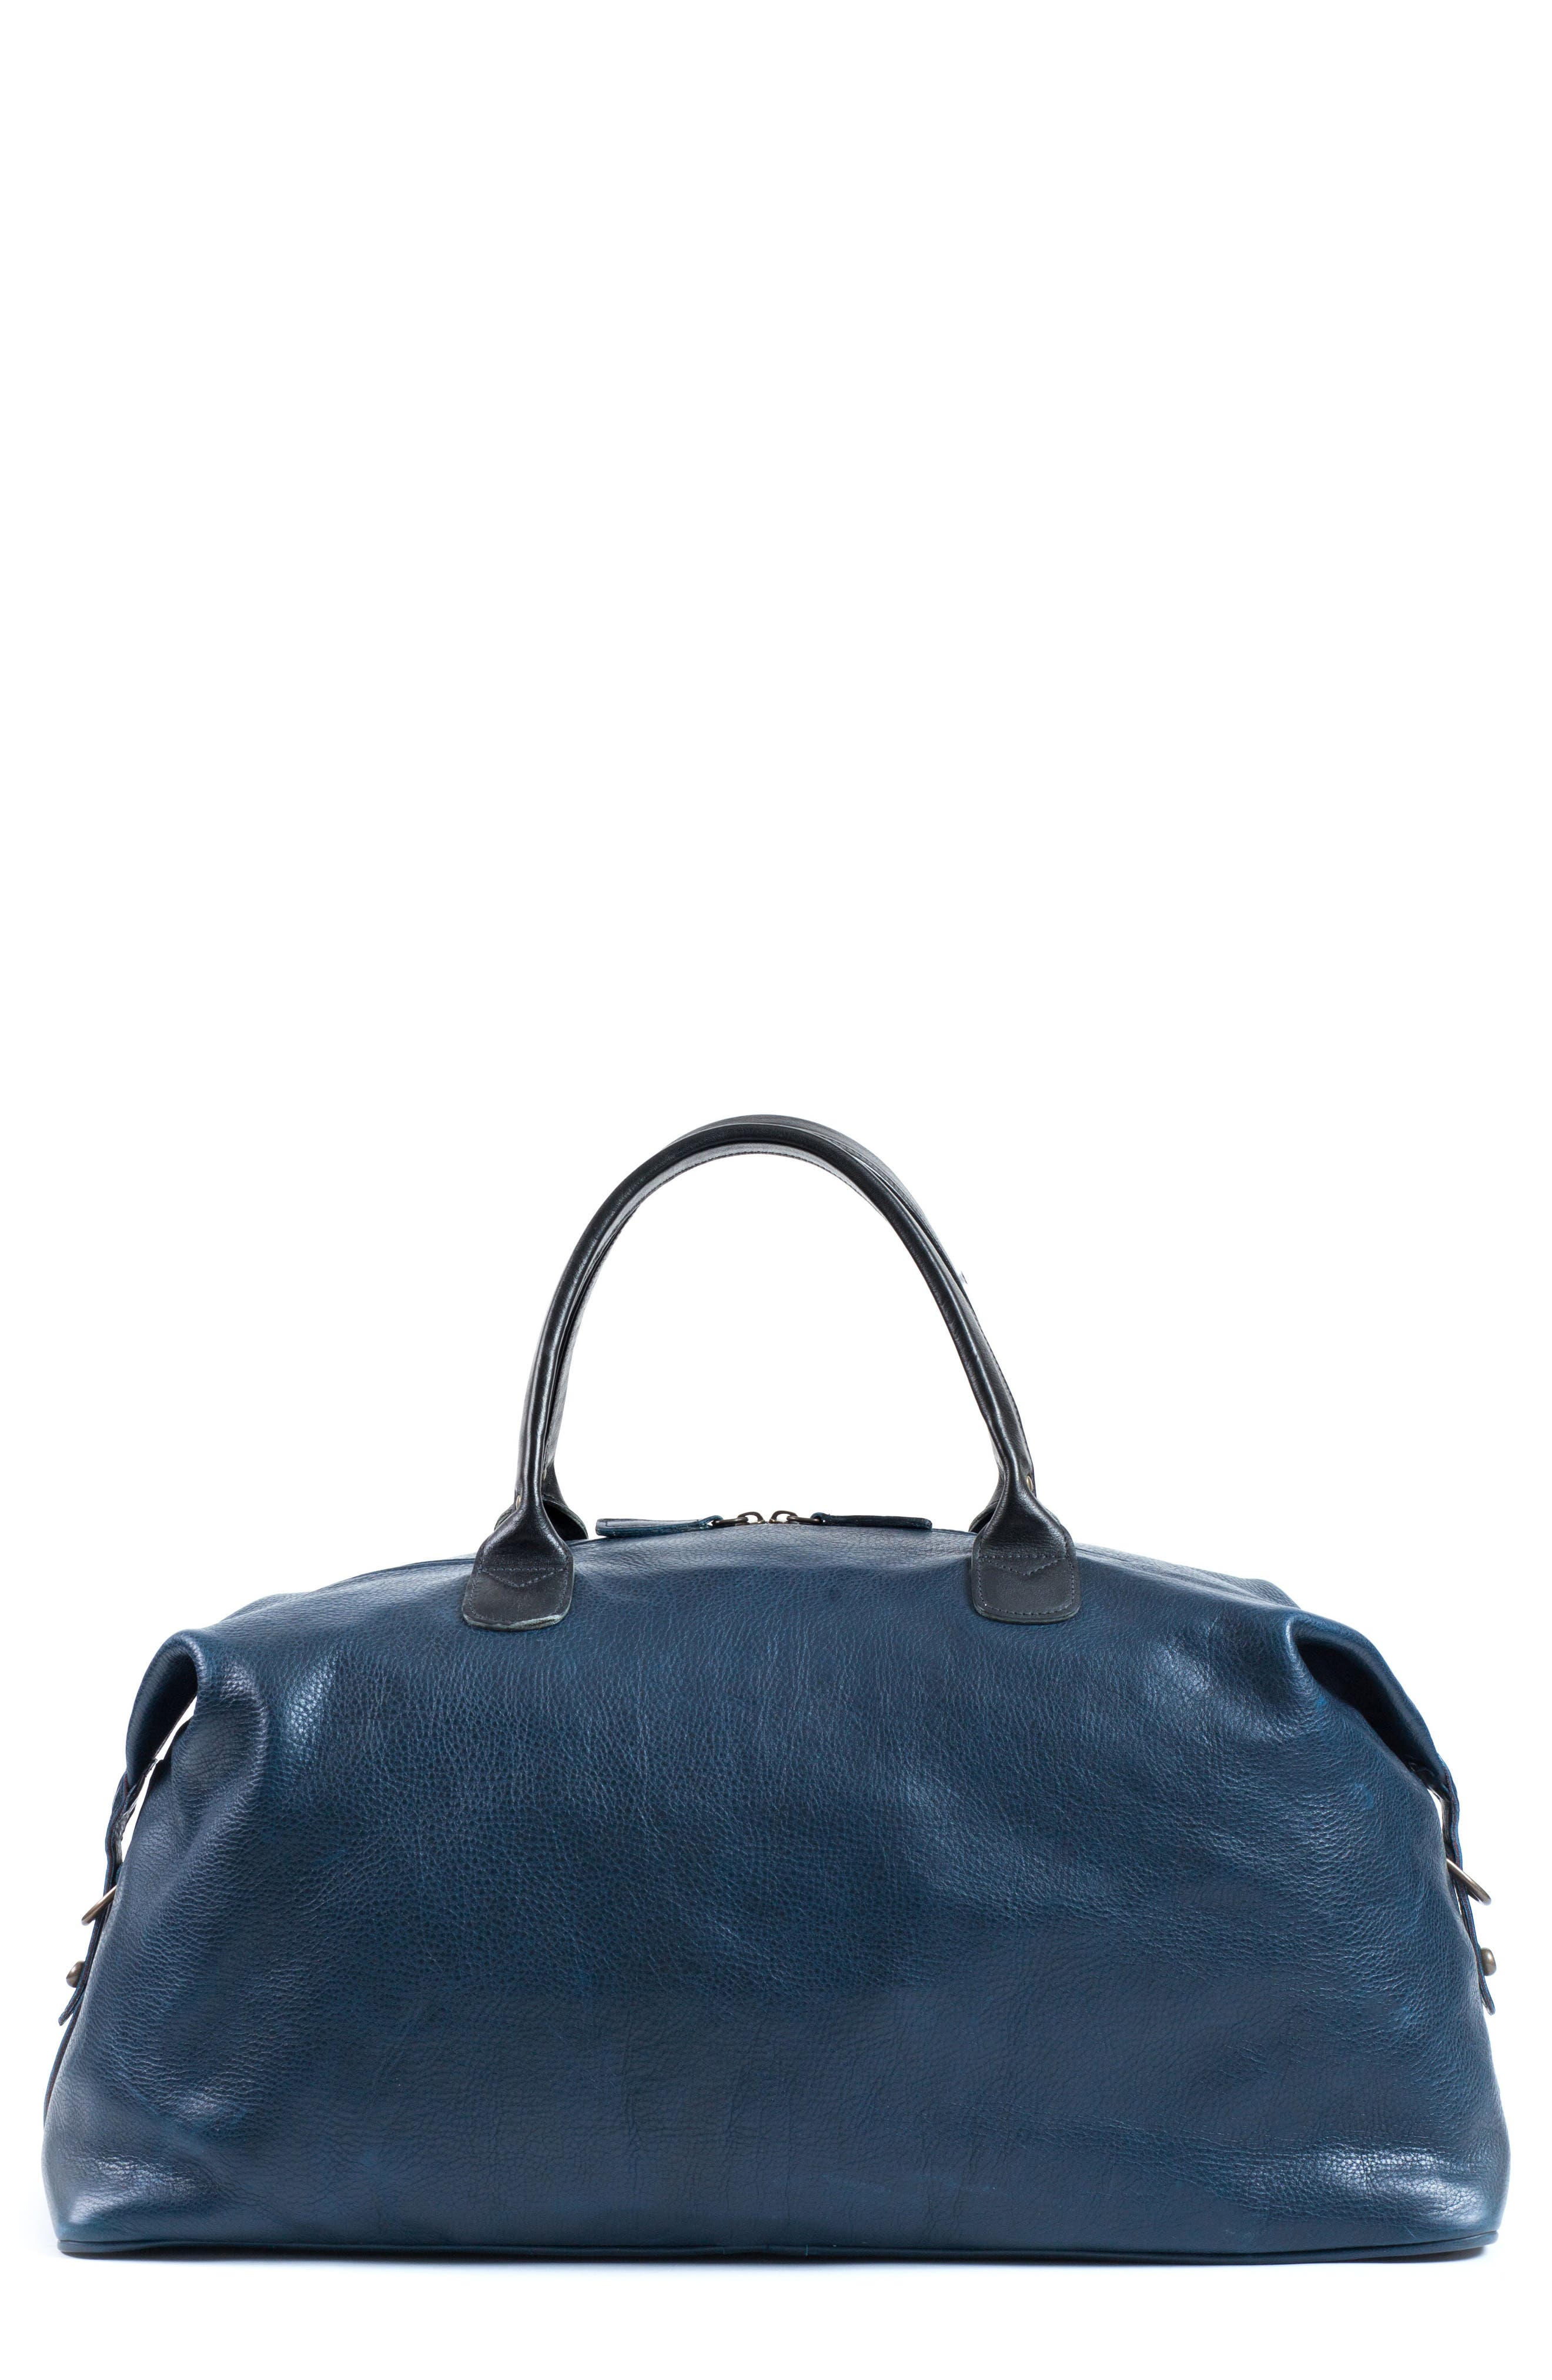 Moore & Giles Benedict Leather Duffel Bag